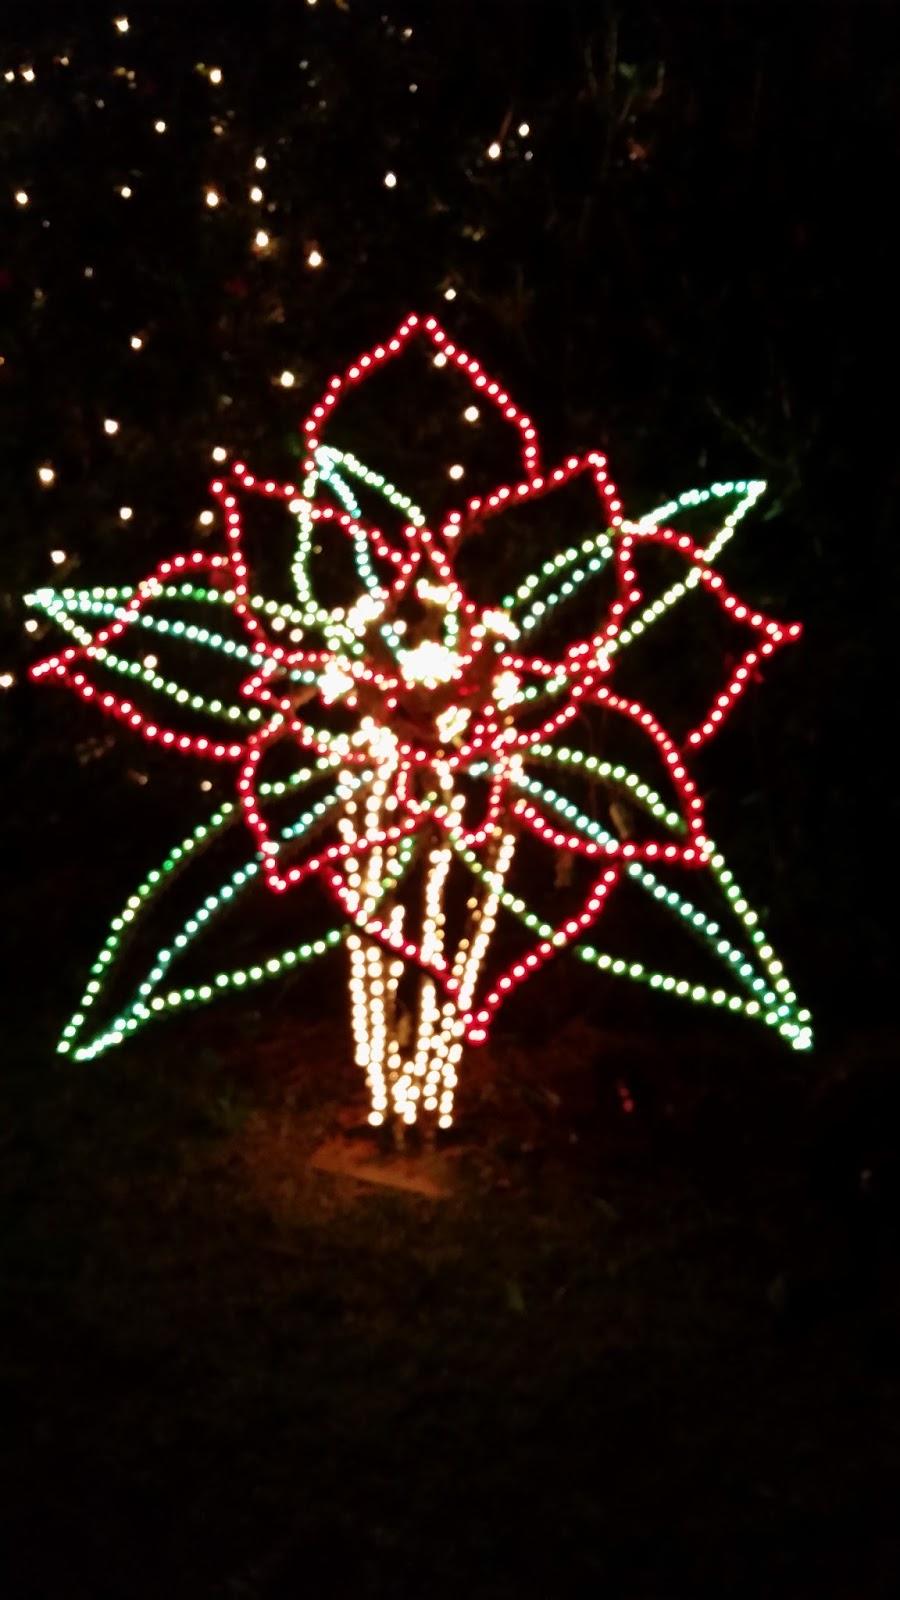 The Wandering Bunny Bellingrath Gardens Christmas Light Display